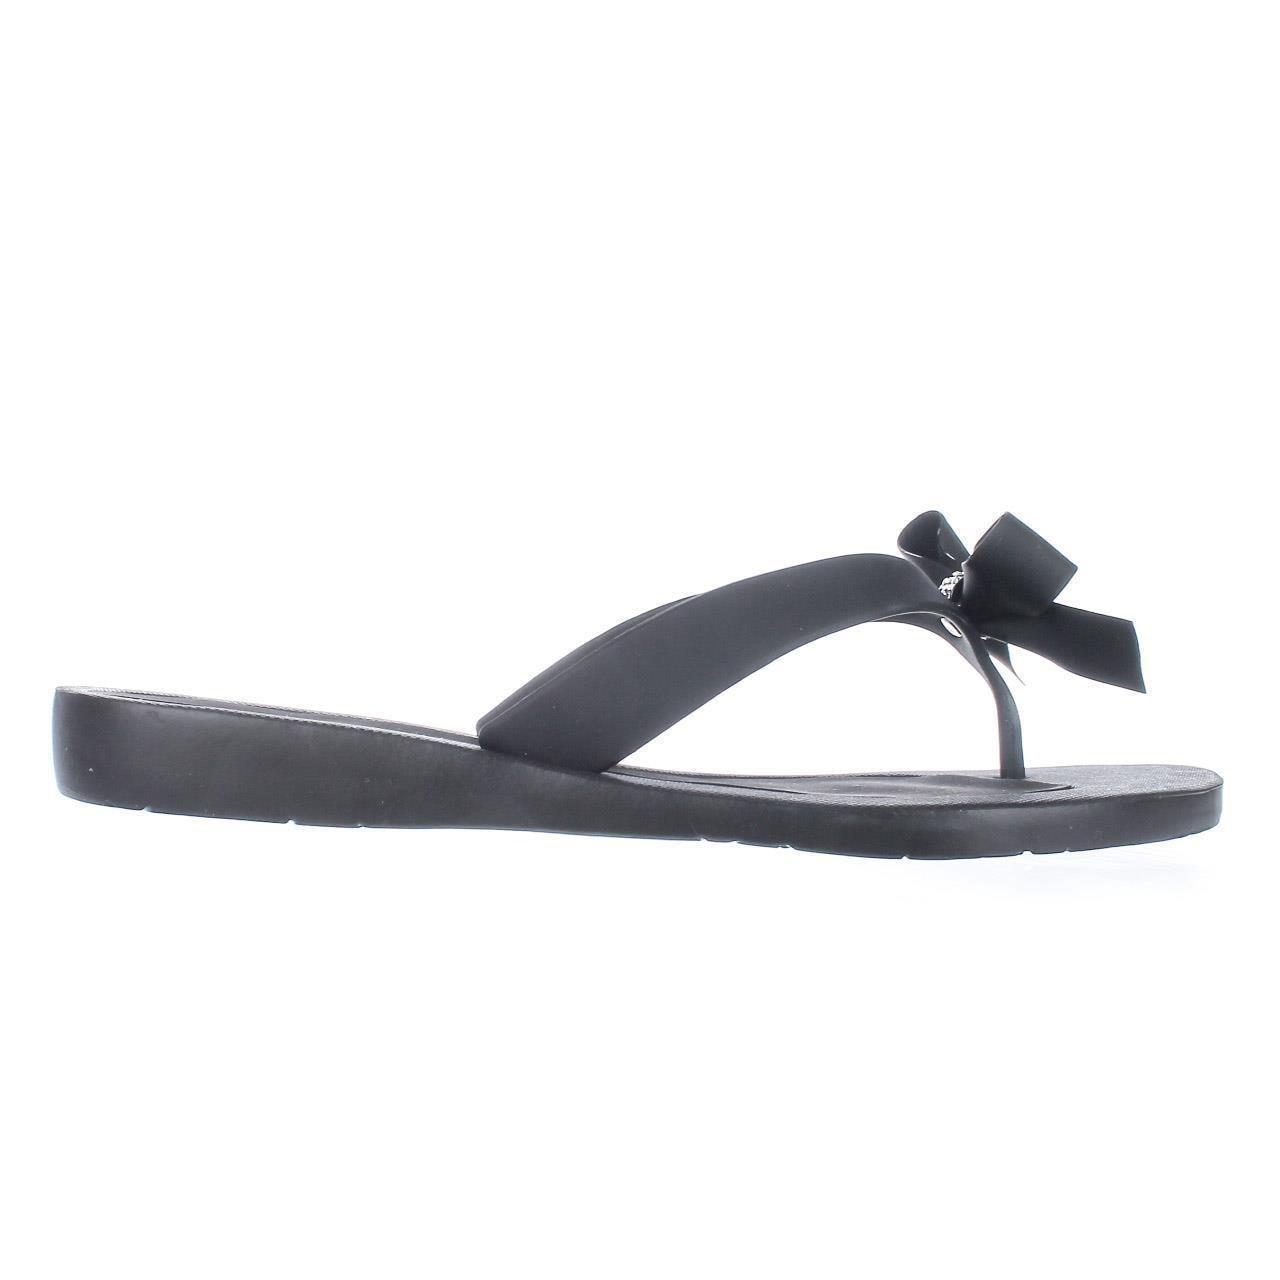 56c276641737c8 Shop GUESS Tutu Bow Thong Flip Flops